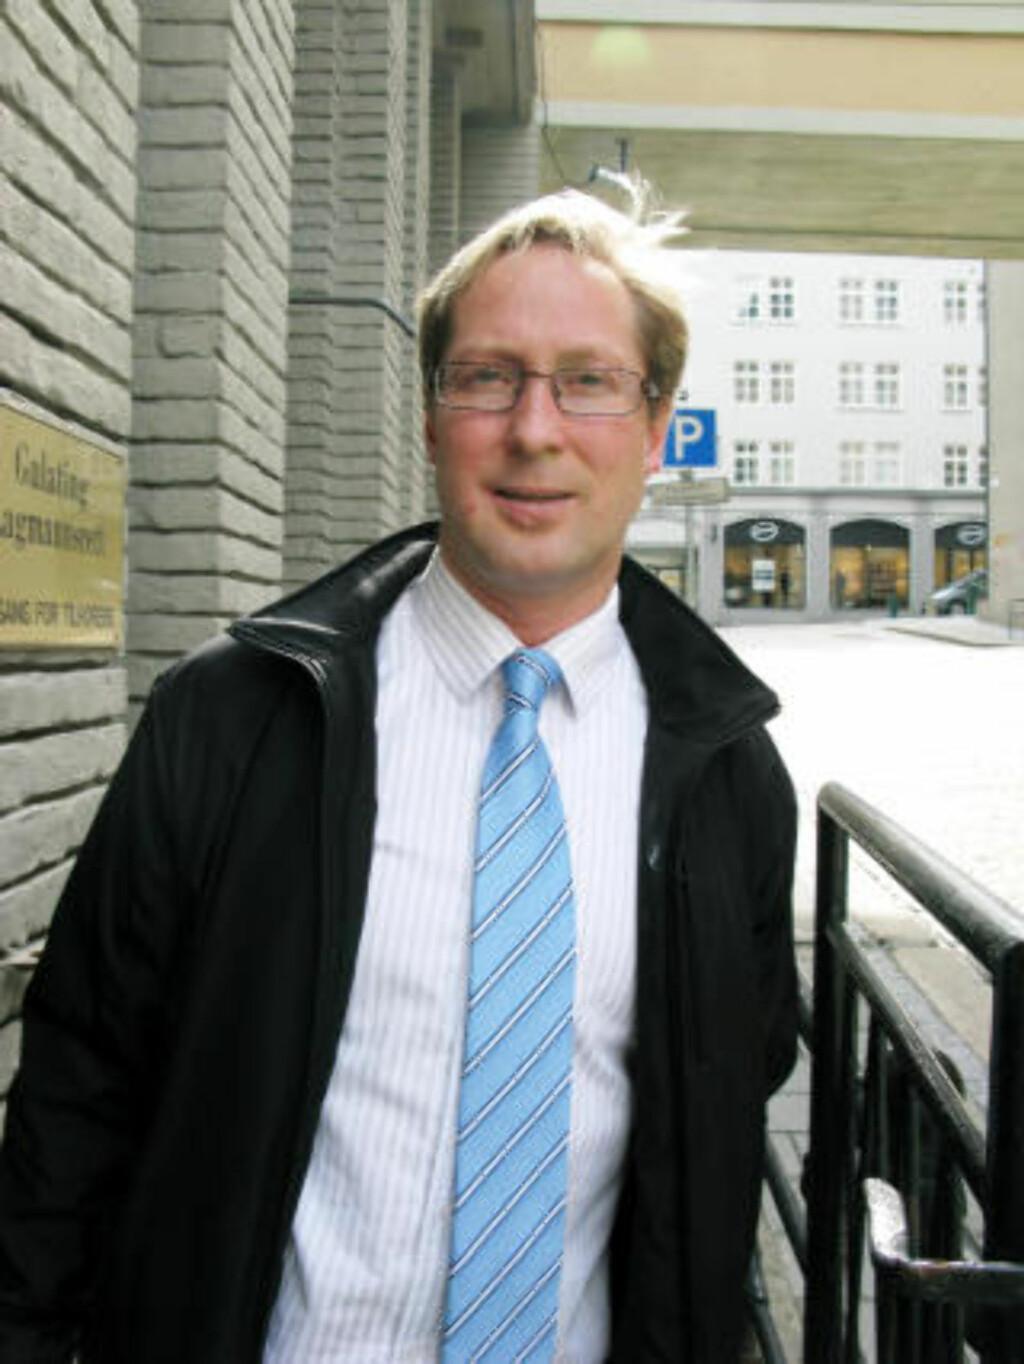 POLITIADVOKAT: Rudolf Christoffersen. Foto: Leif Stang